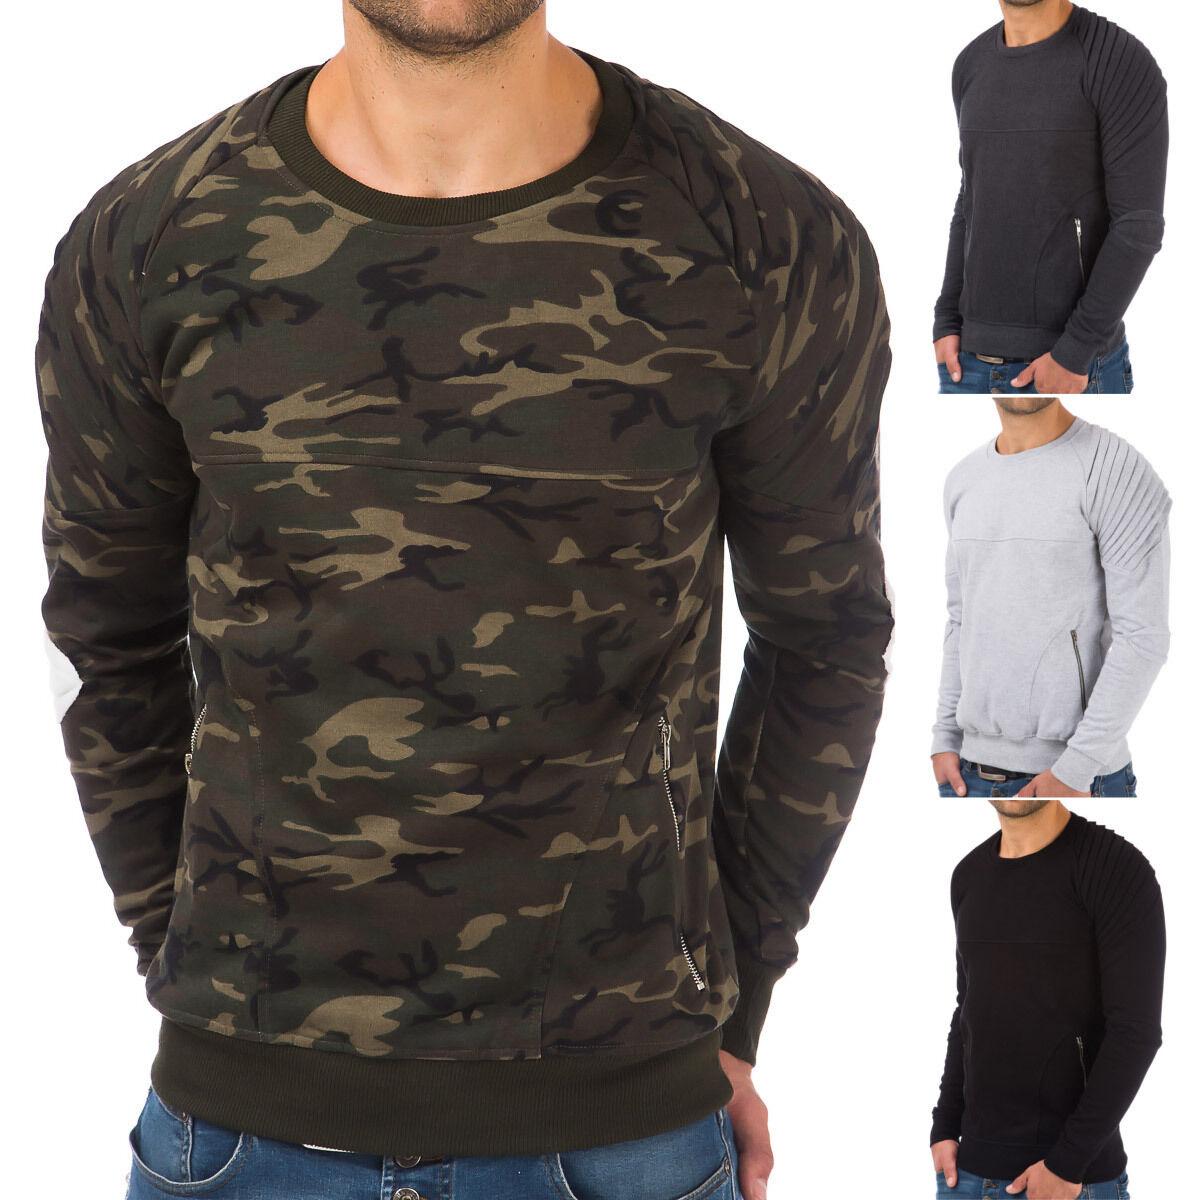 Pullover Herren Hoodie Sweatshirt Fitness Jogging Sport Shirt Training Pulli